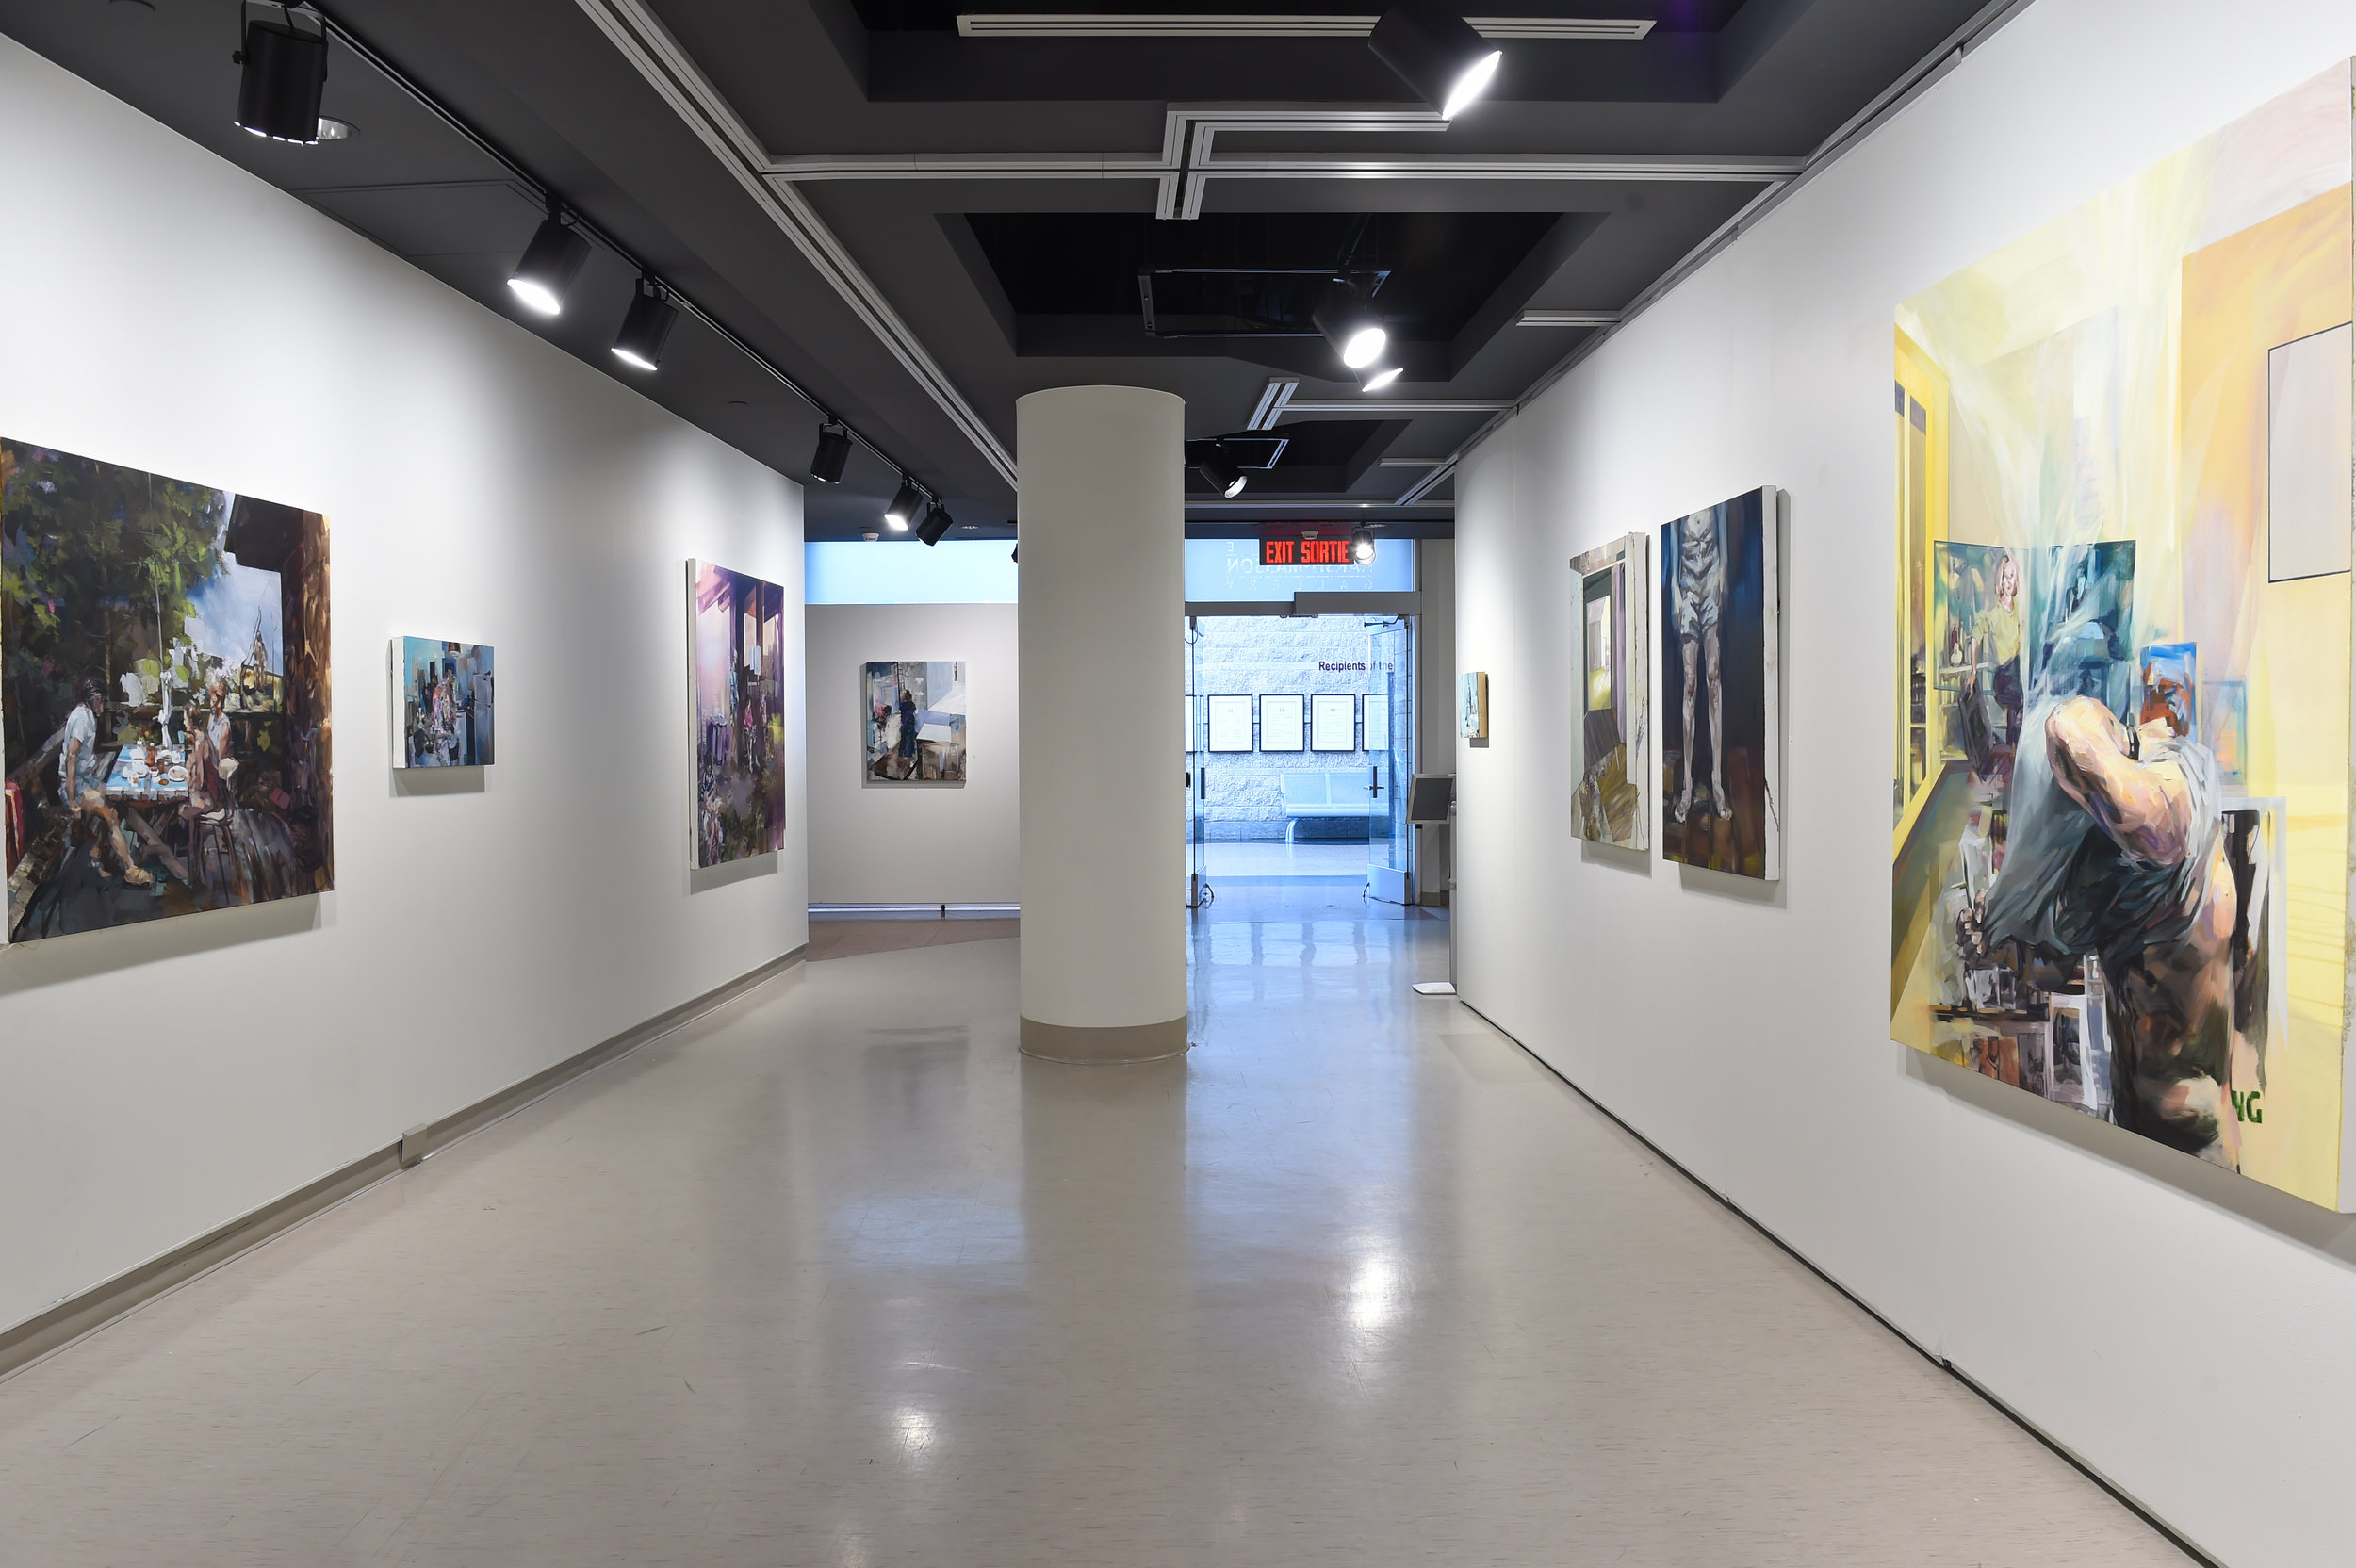 Painter, Painter Installation View, 2016, Karsh Masson Gallery (Photo Credit : City of Ottawa)